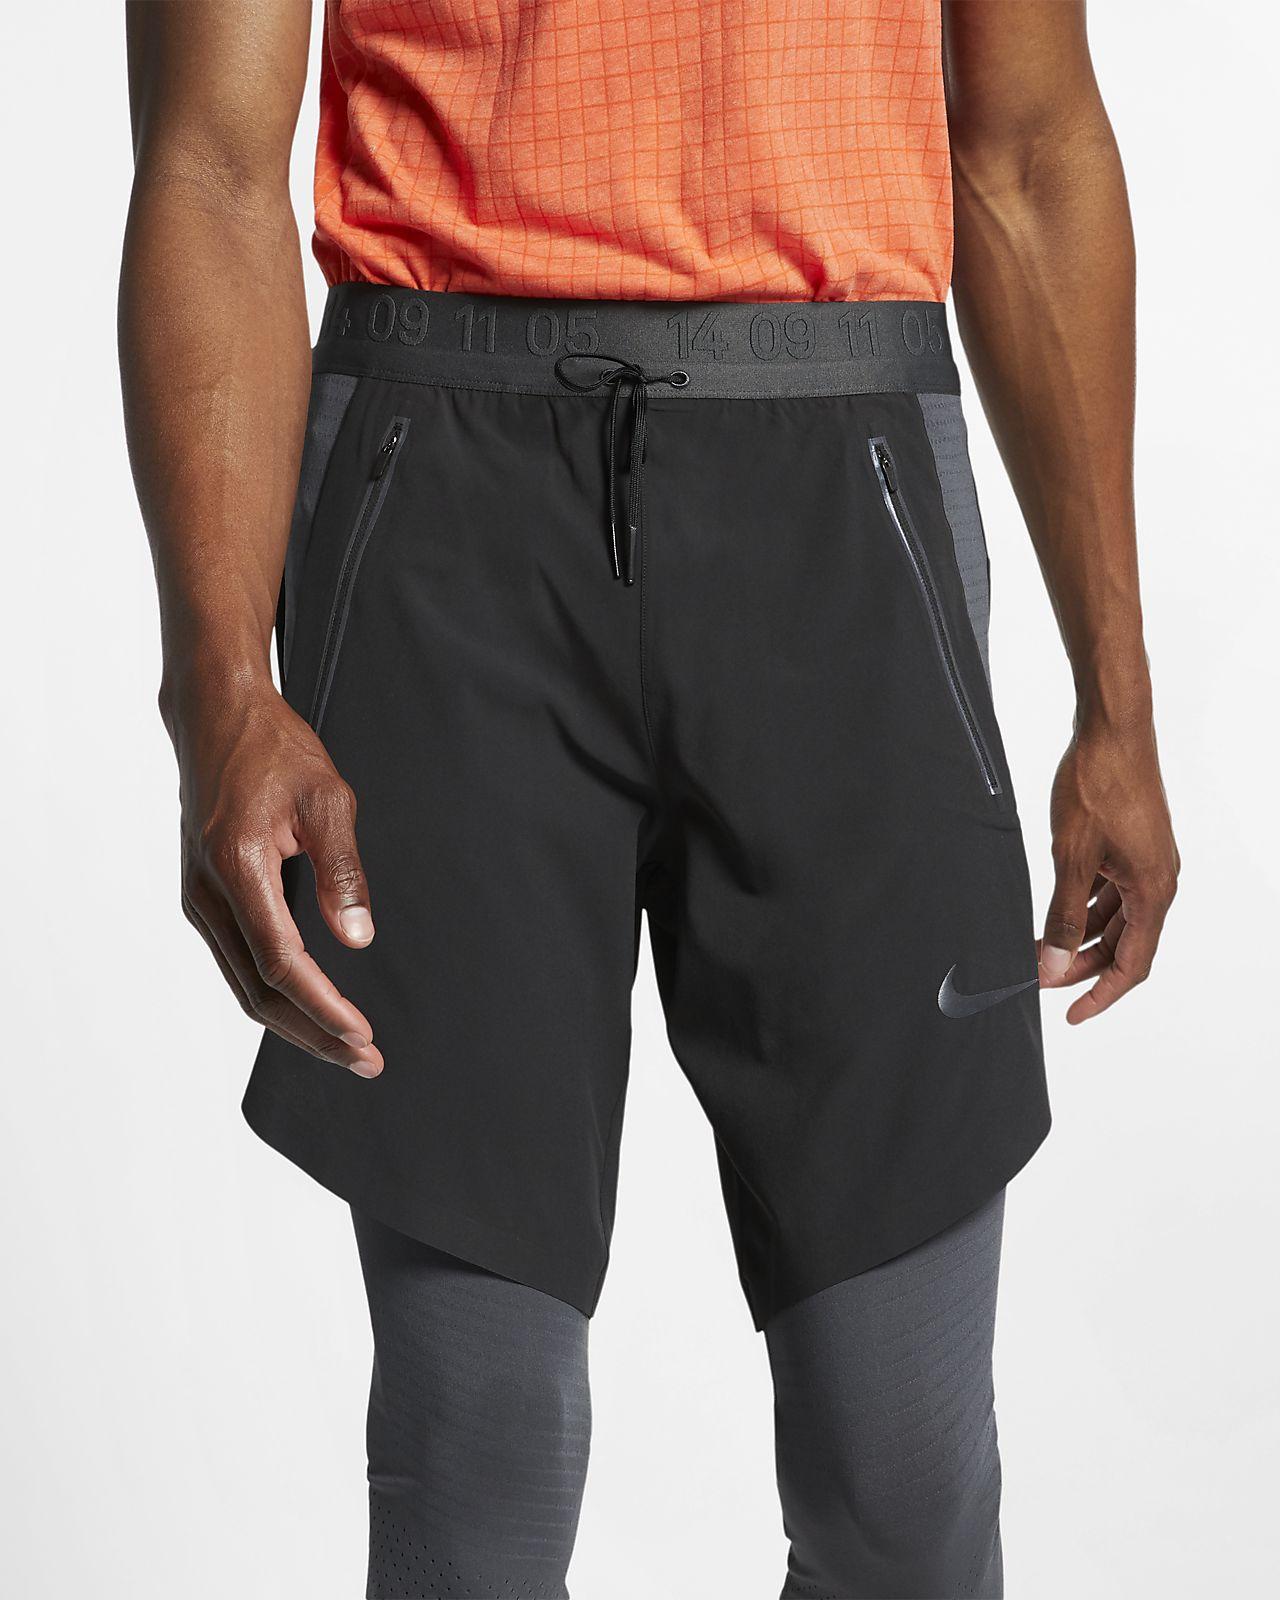 Nike Tech Pack Men's 3/4 Running Trousers